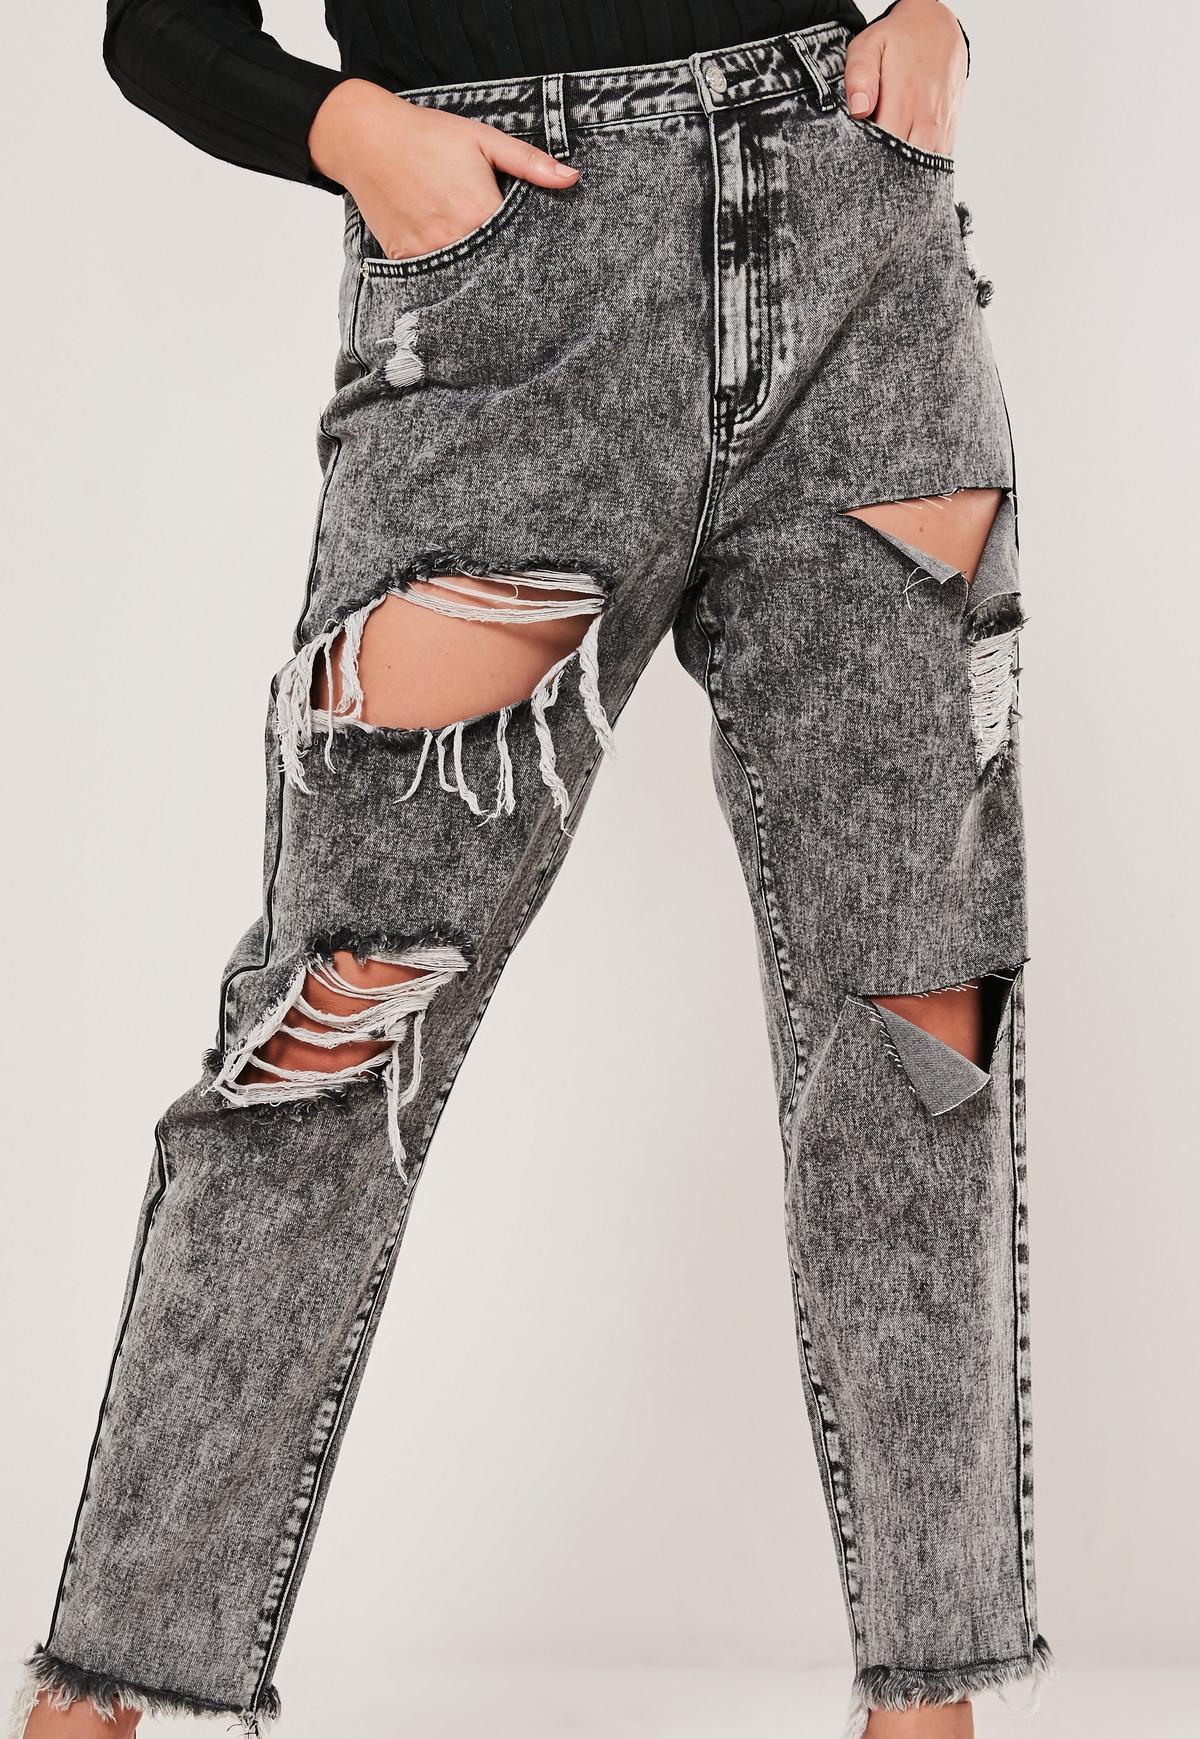 Plus Size Black Acid Wash Distressed Mom Jeans